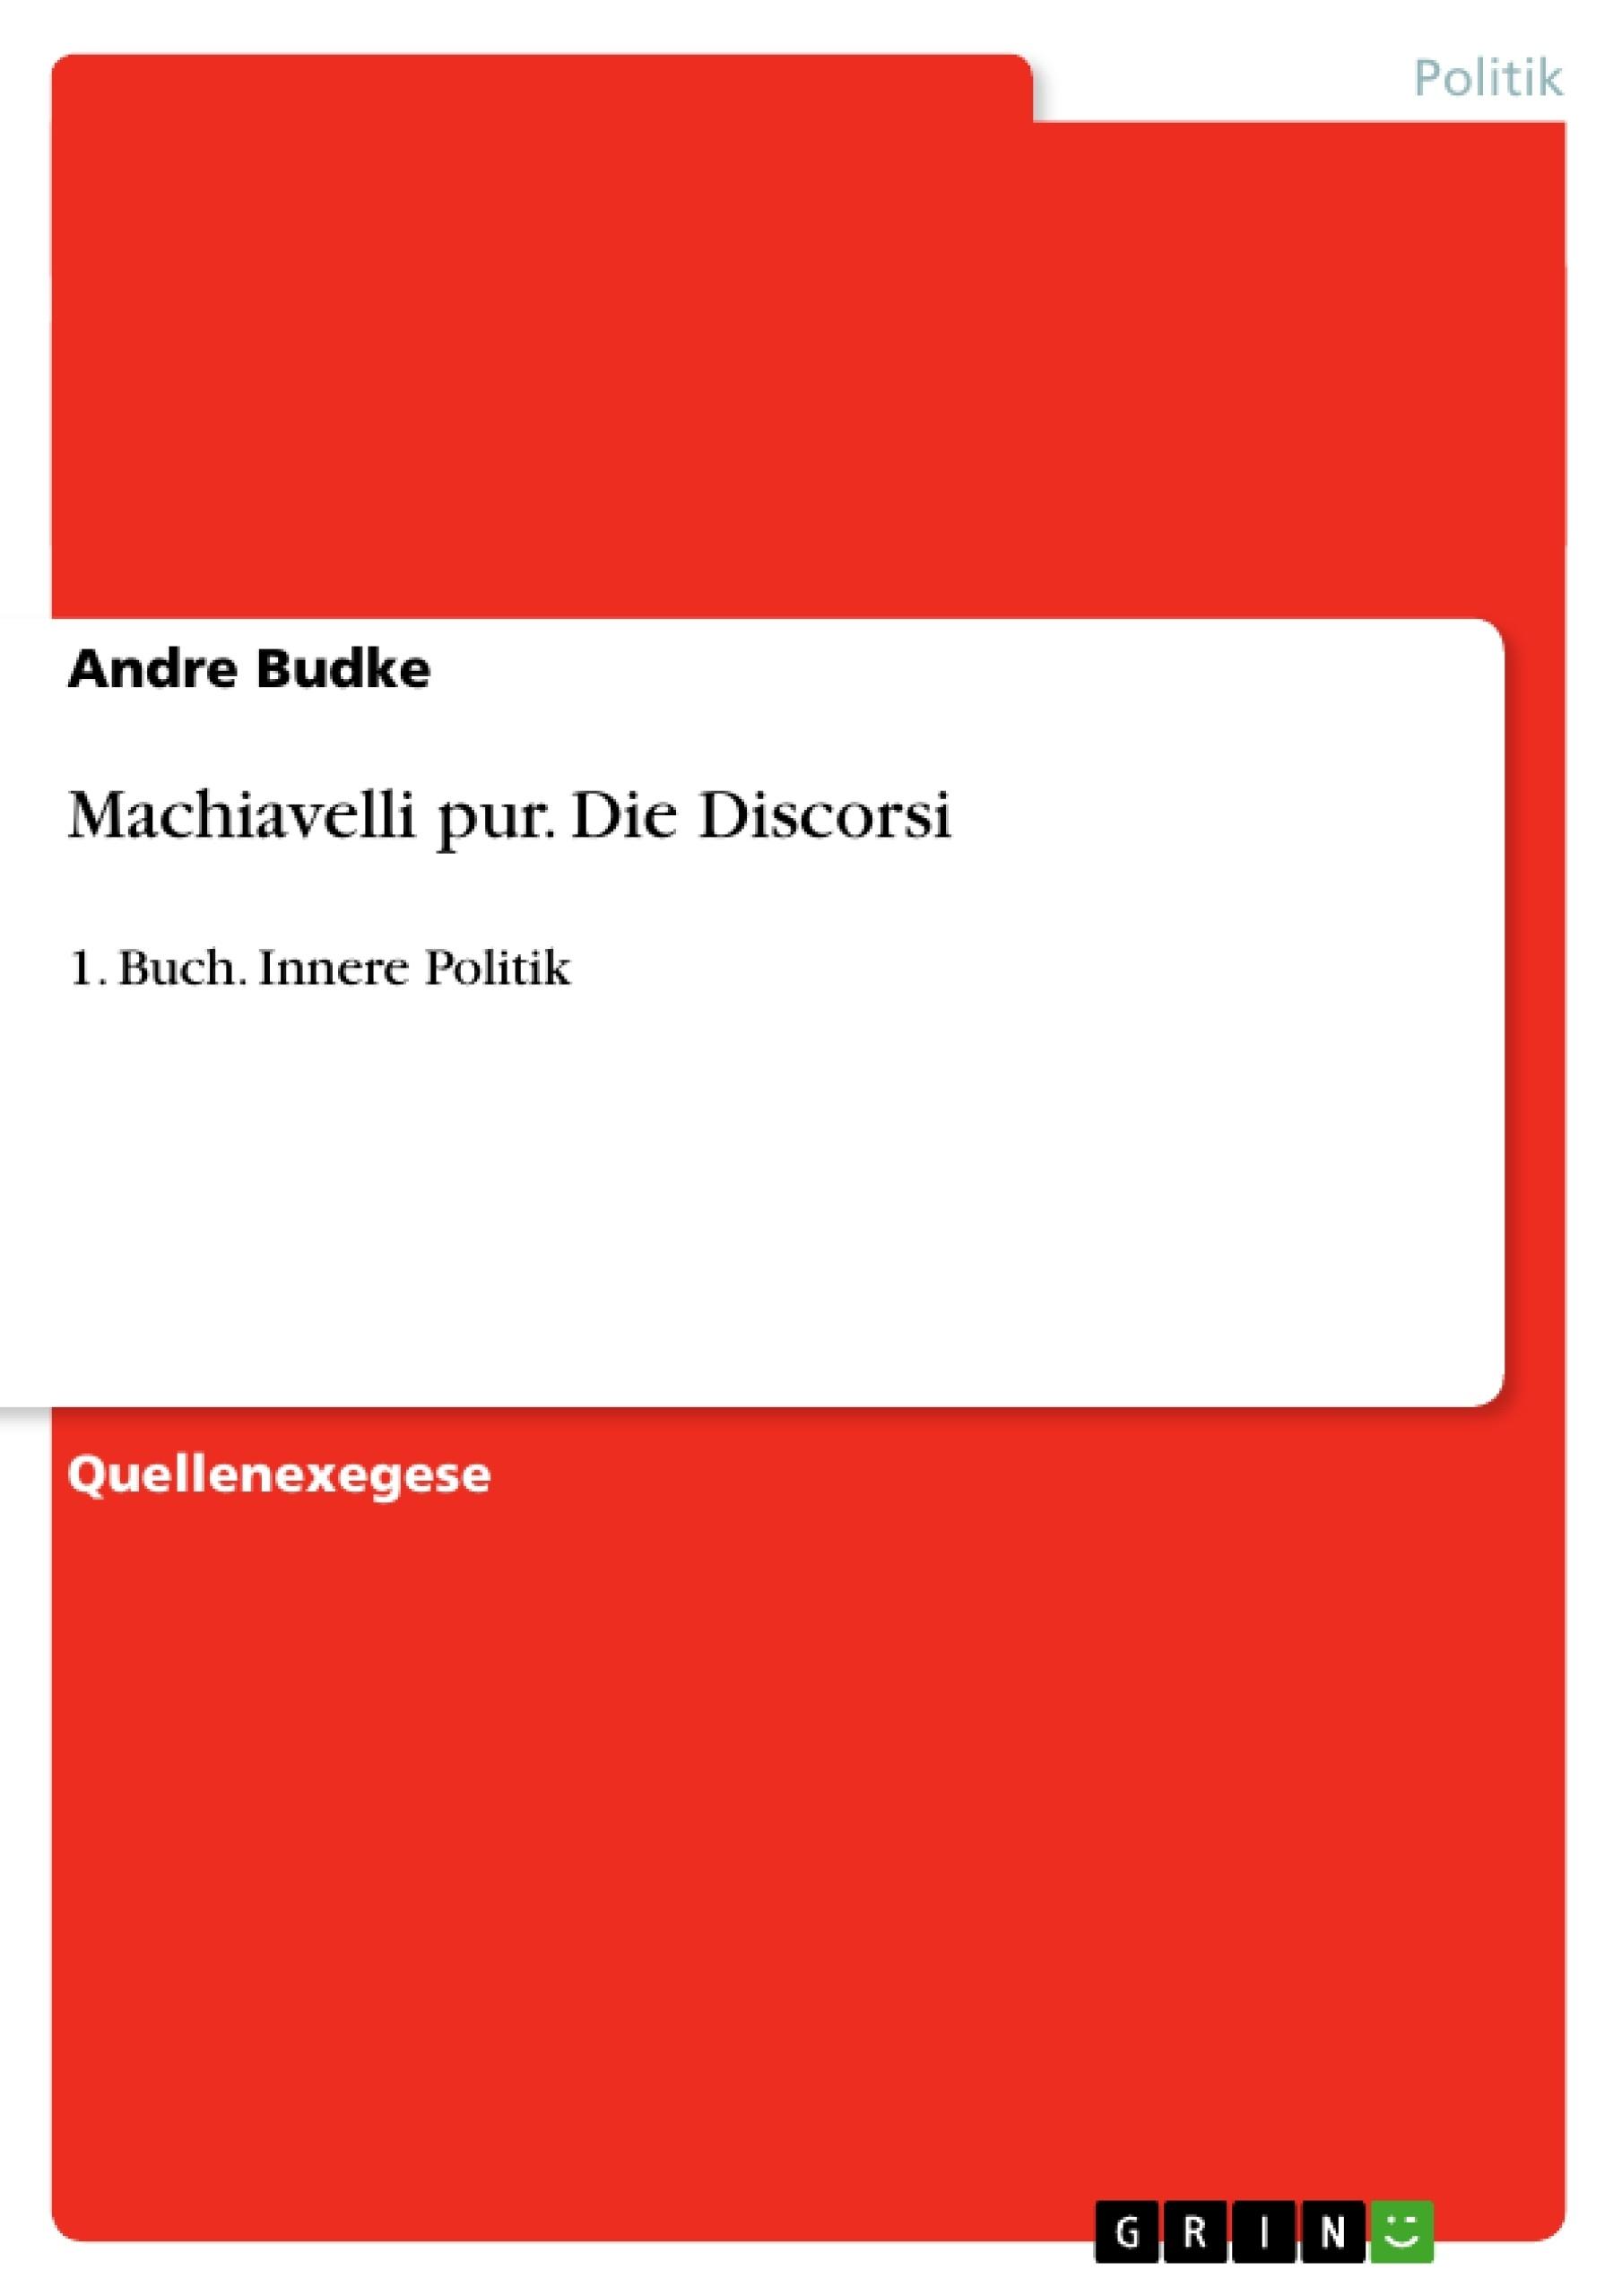 Titel: Machiavelli pur. Die Discorsi